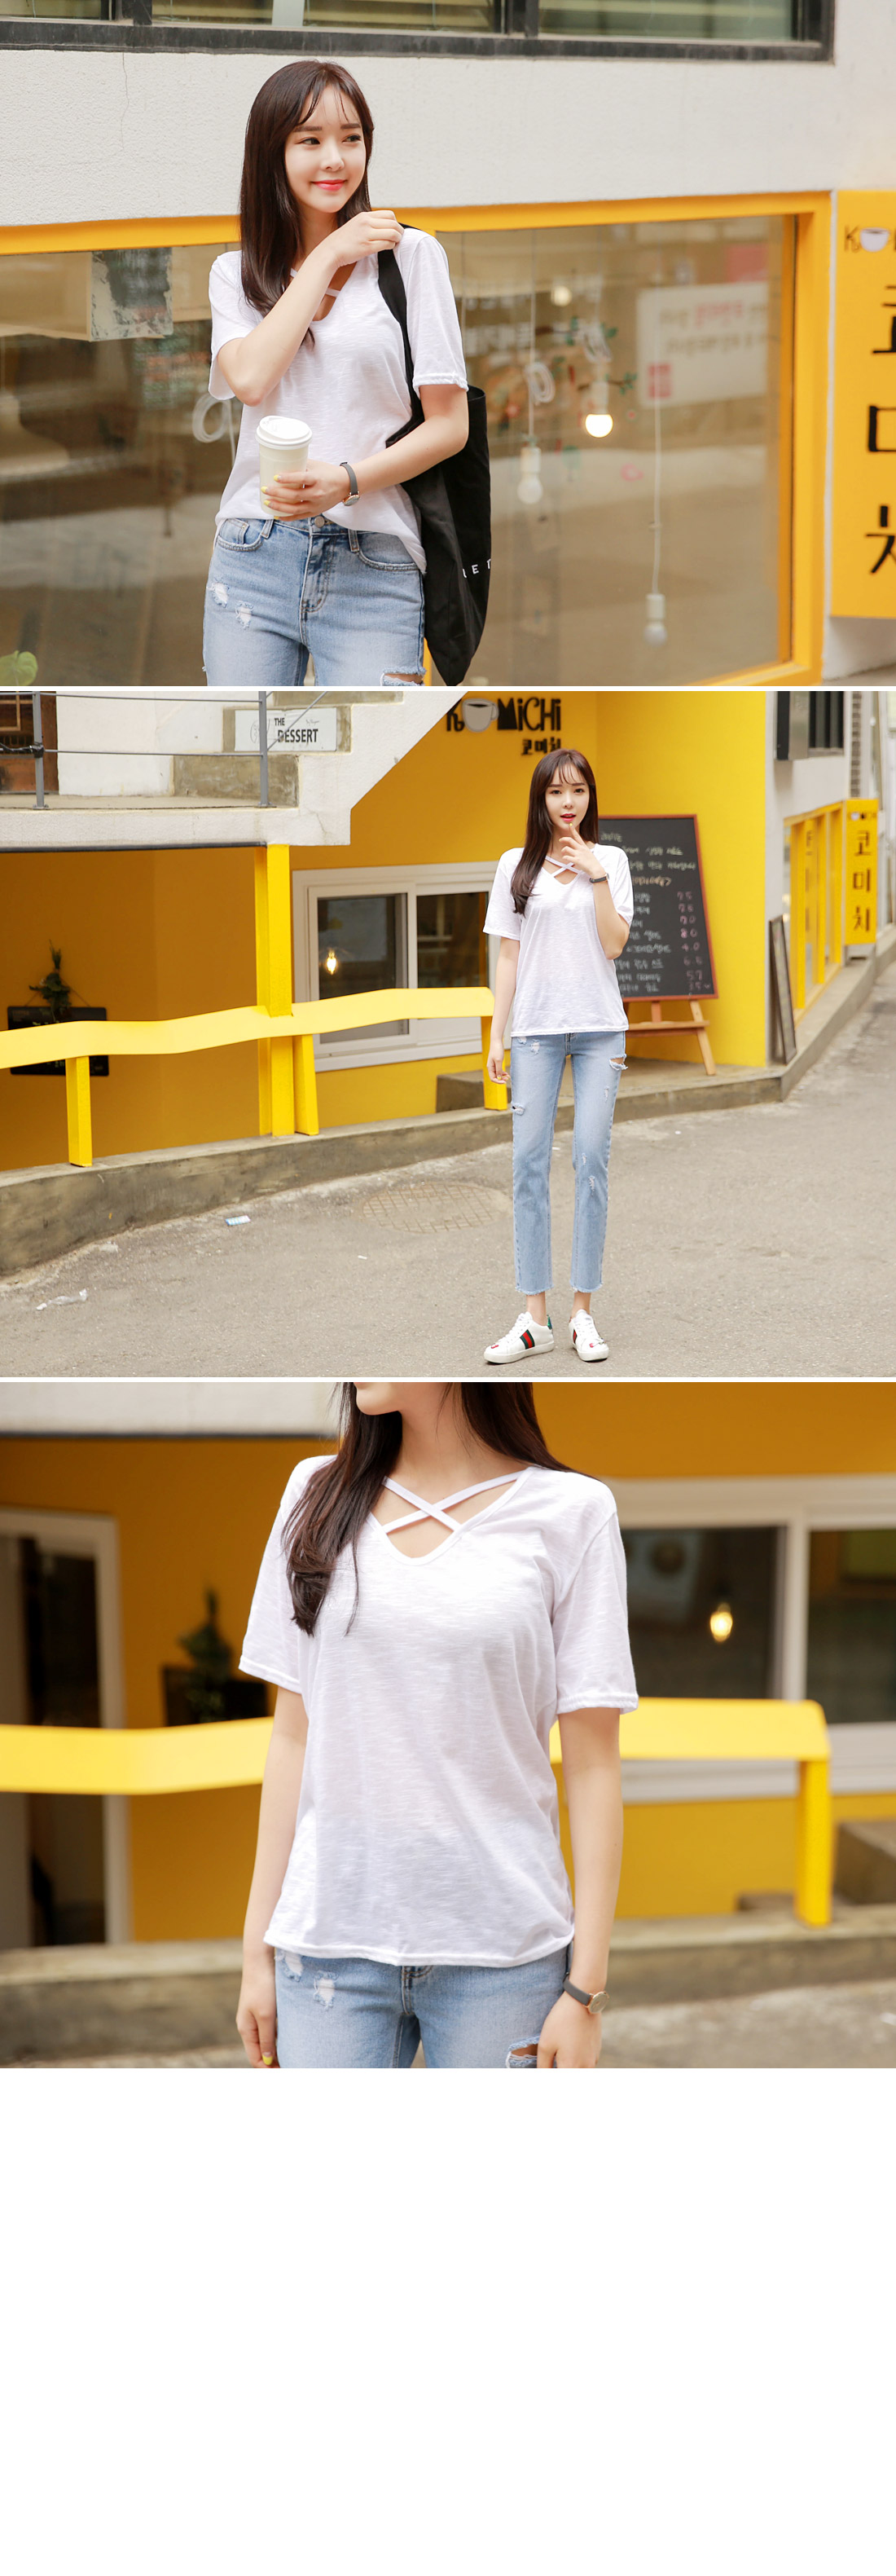 X-shirt